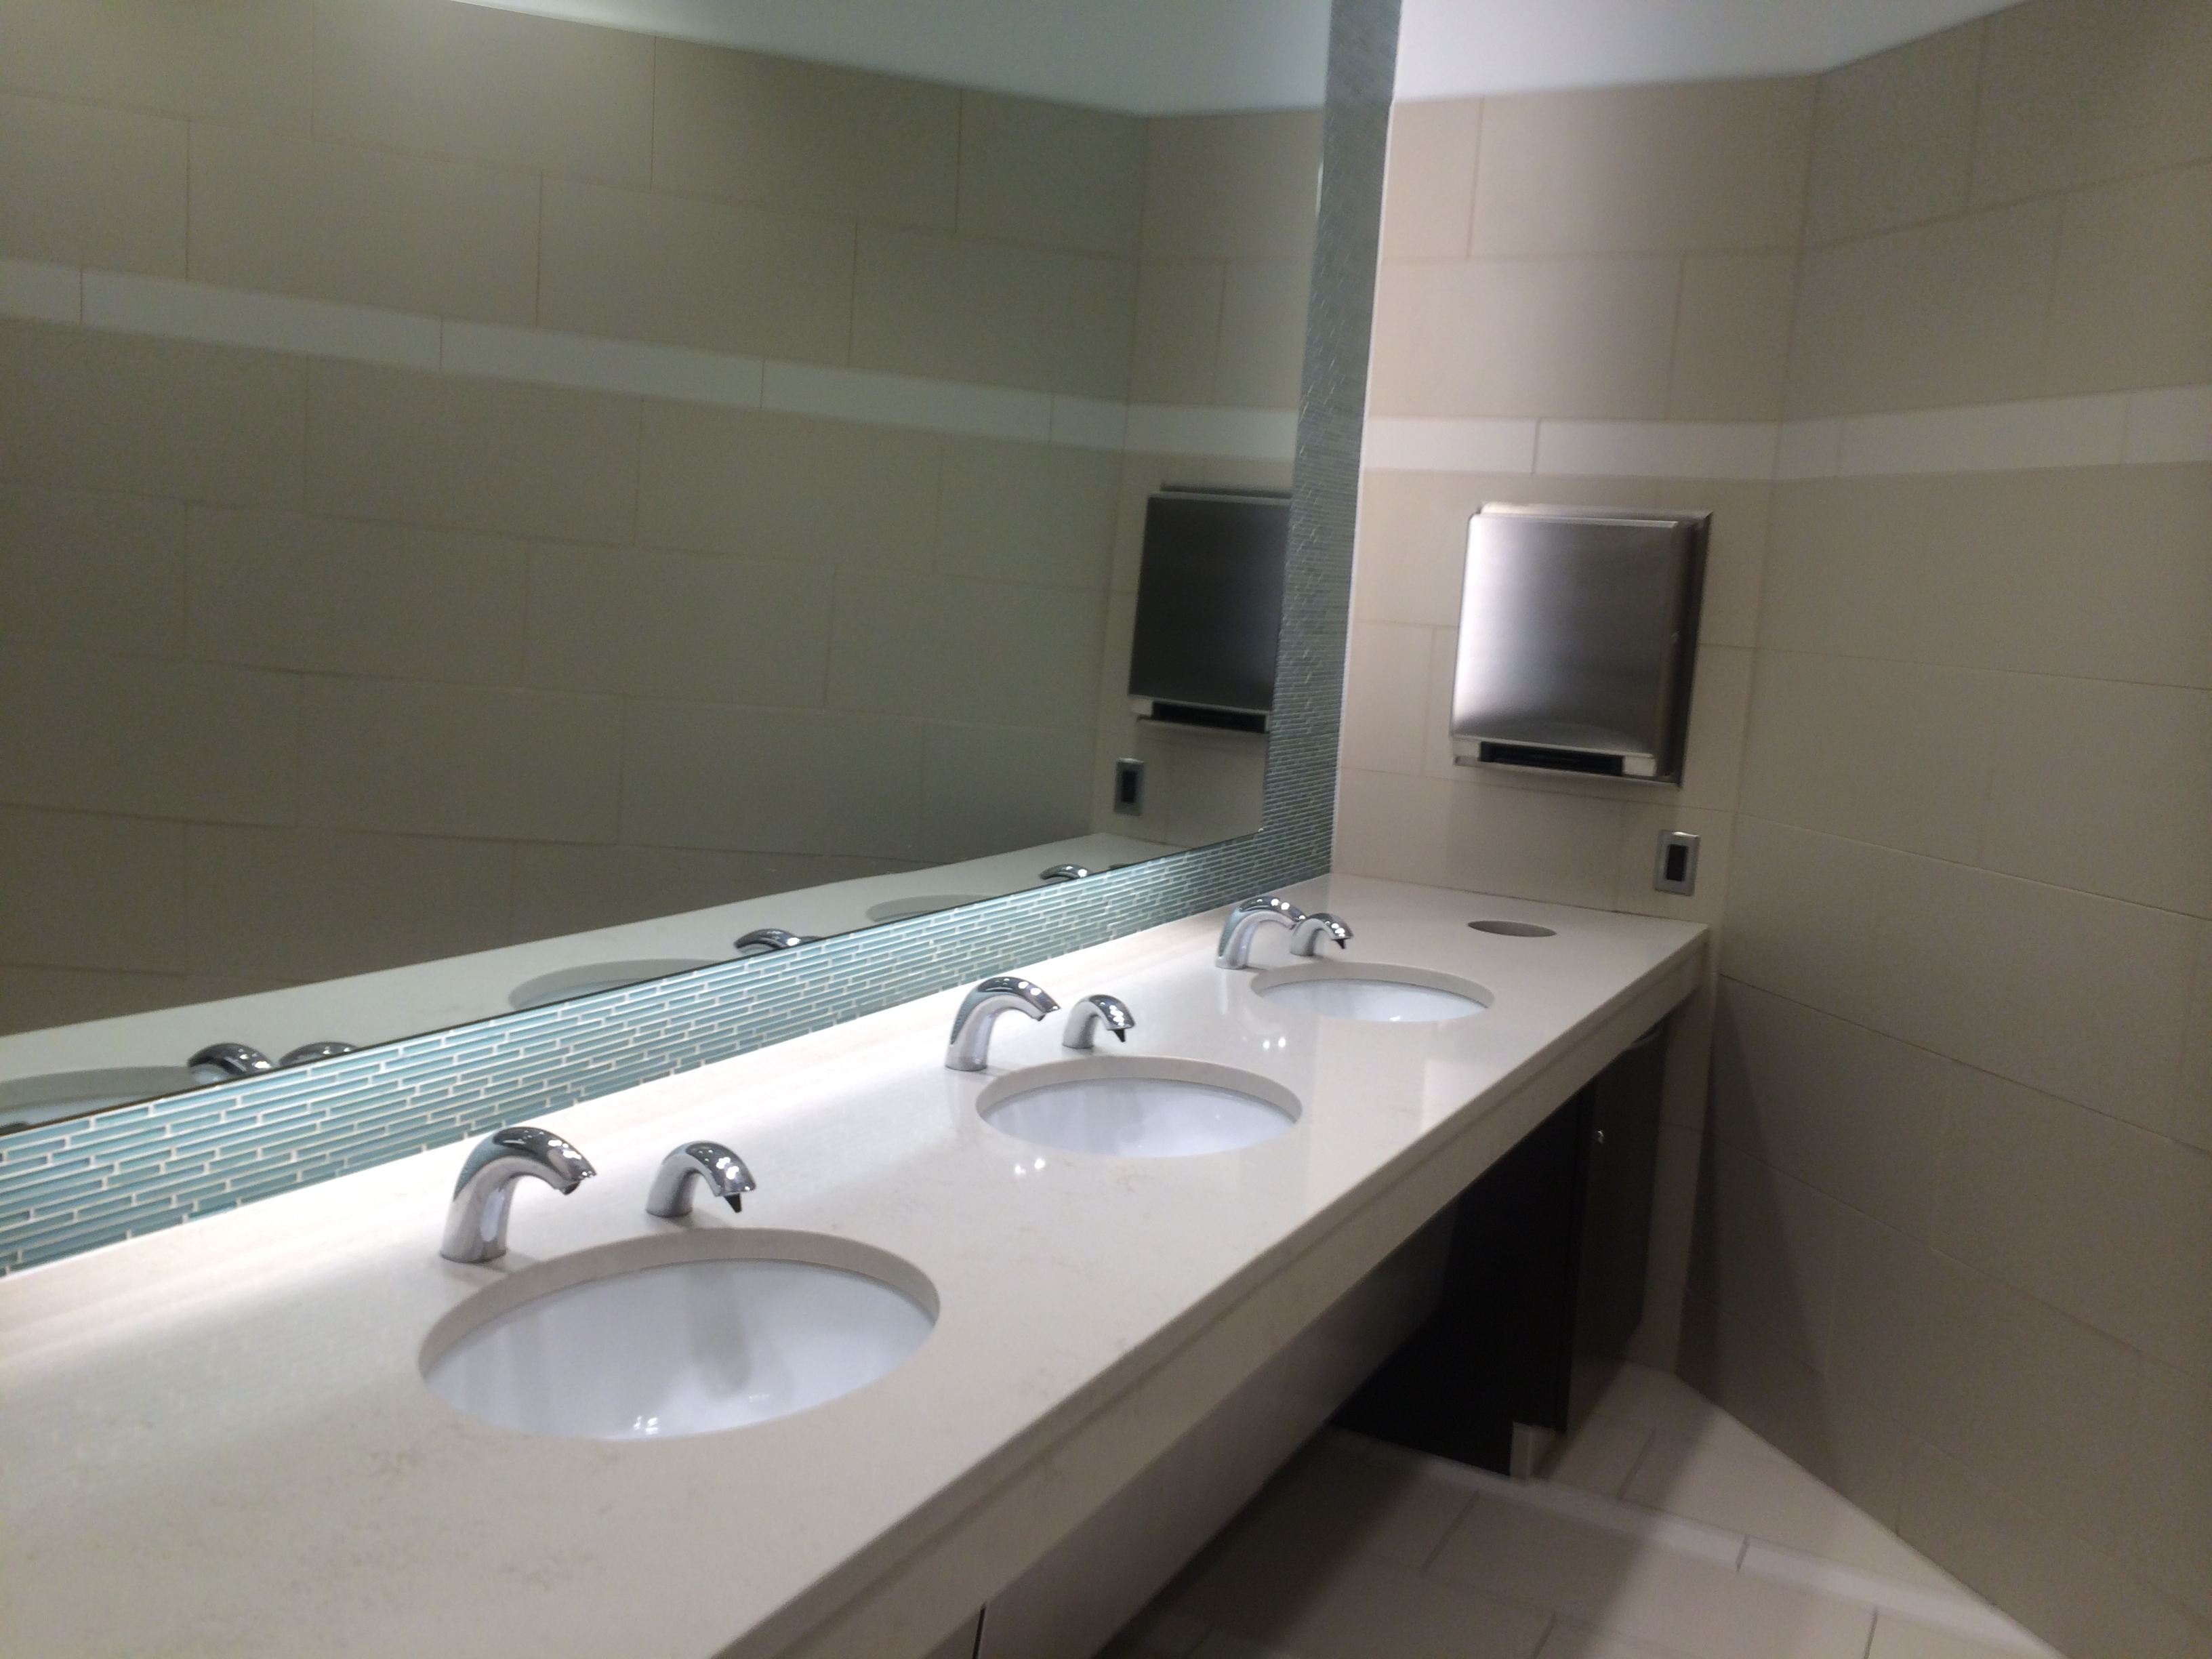 Bathroom sink faucet with sensor bathroom design ideas for Public bathroom sink